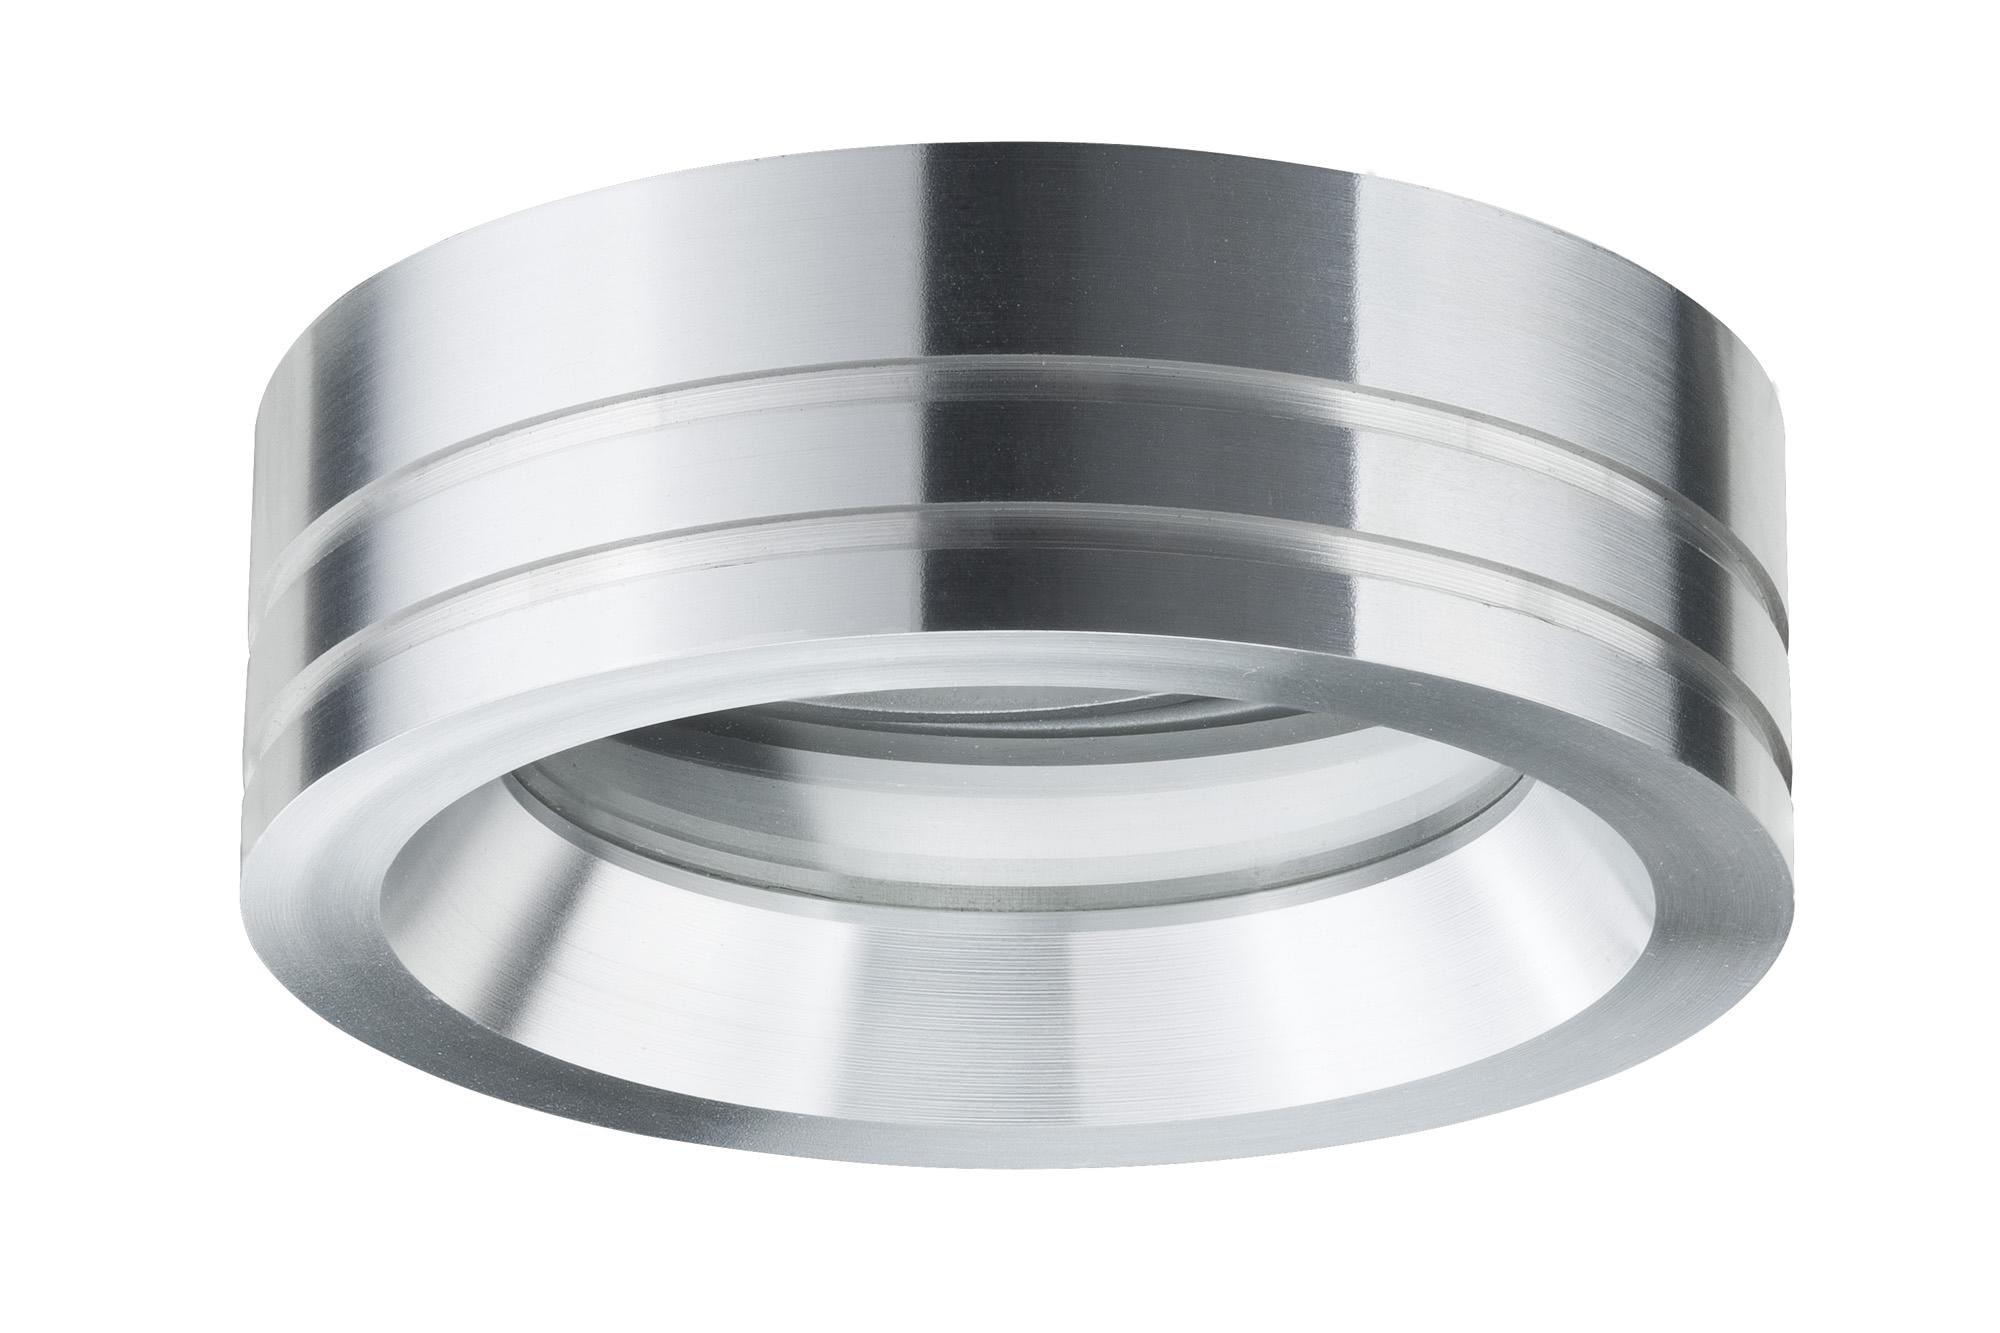 Paulmann. 92550 Светильник встраиваемый Premium EBL Curl rund schwenkb. max 35W